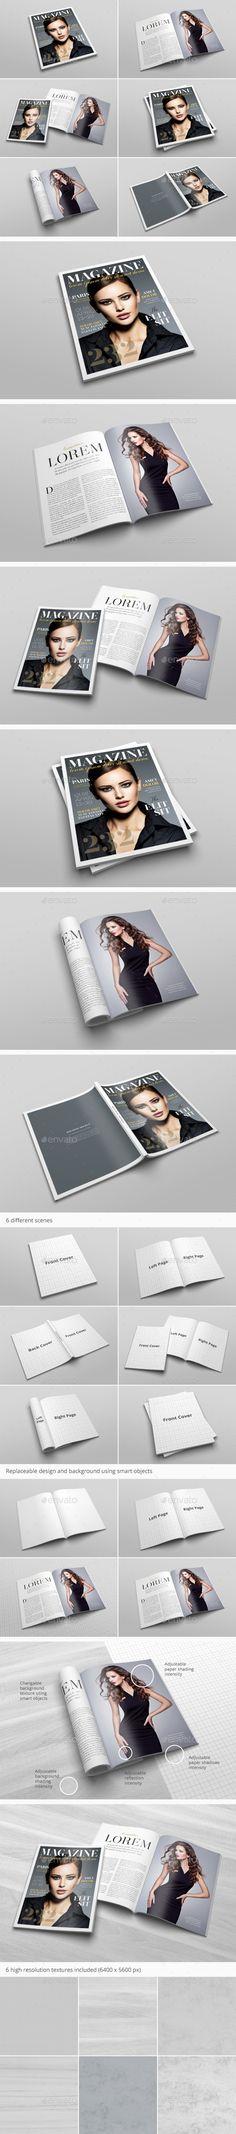 US Letter Magazine Mockup - Print #Product #Mock-Ups Download here:  https://graphicriver.net/item/us-letter-magazine-mockup/20286685?ref=alena994